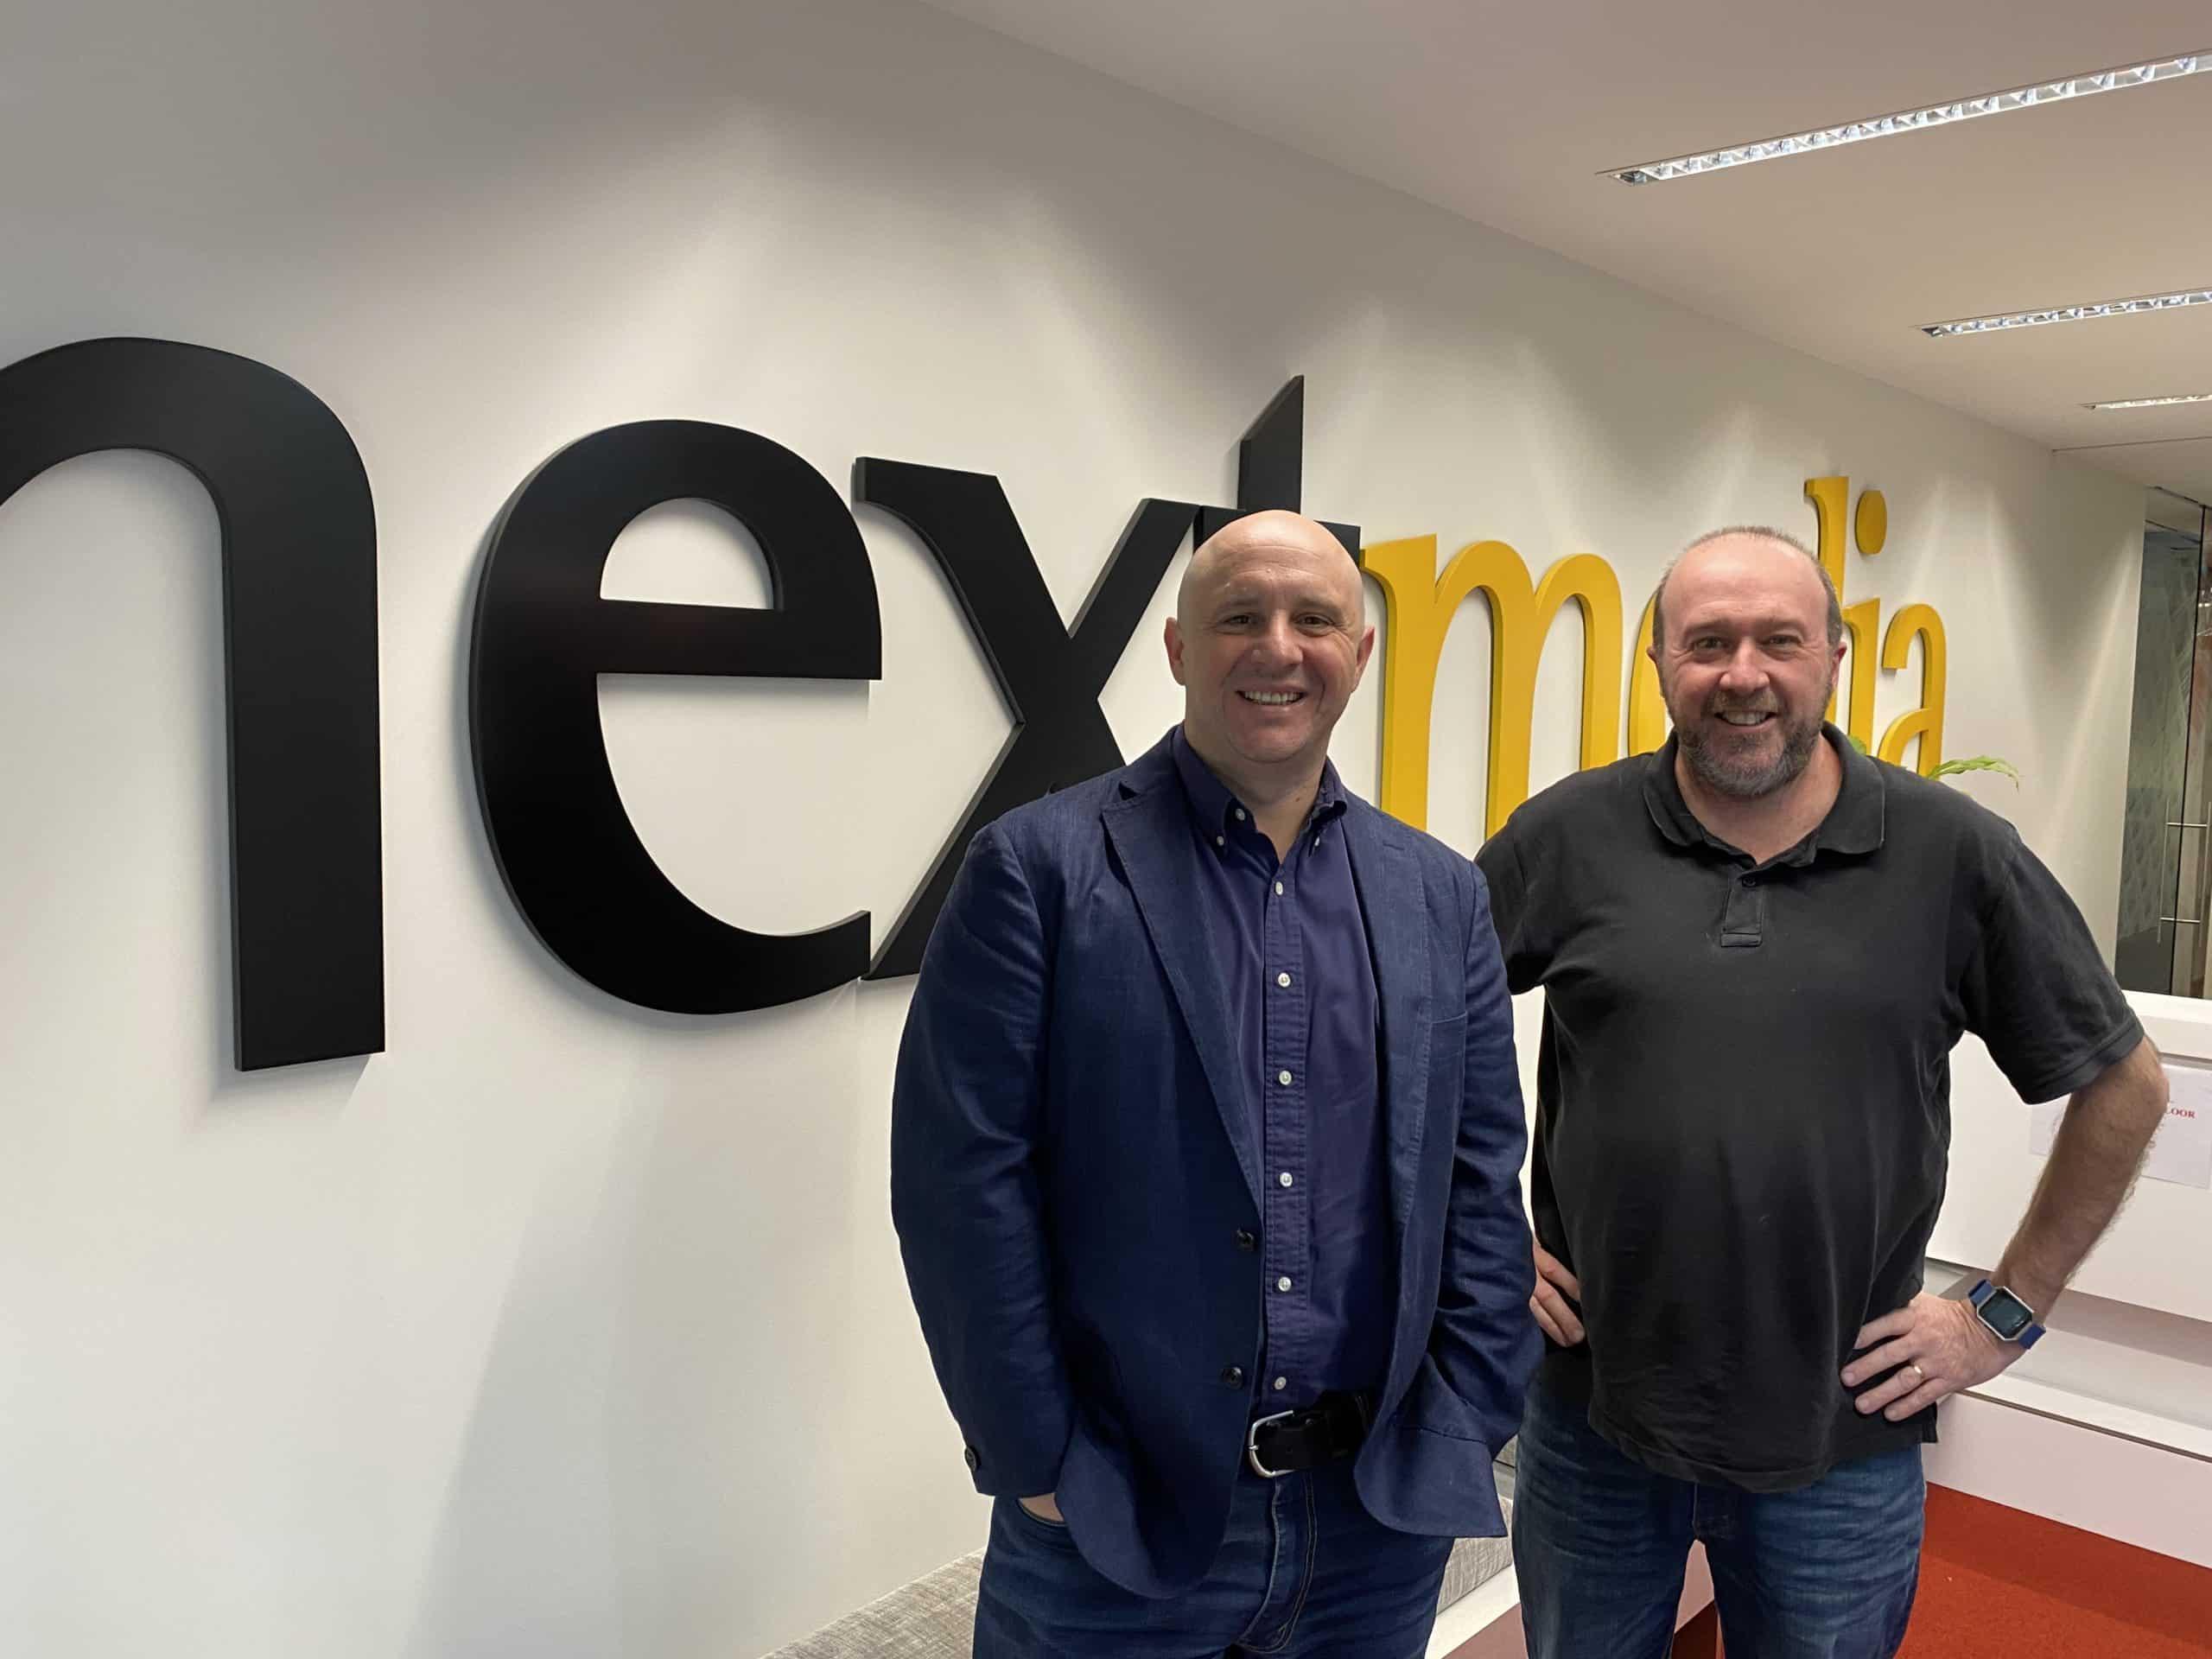 nextmedia appoints Andrew Birmingham Group Managing Director of B2B titles